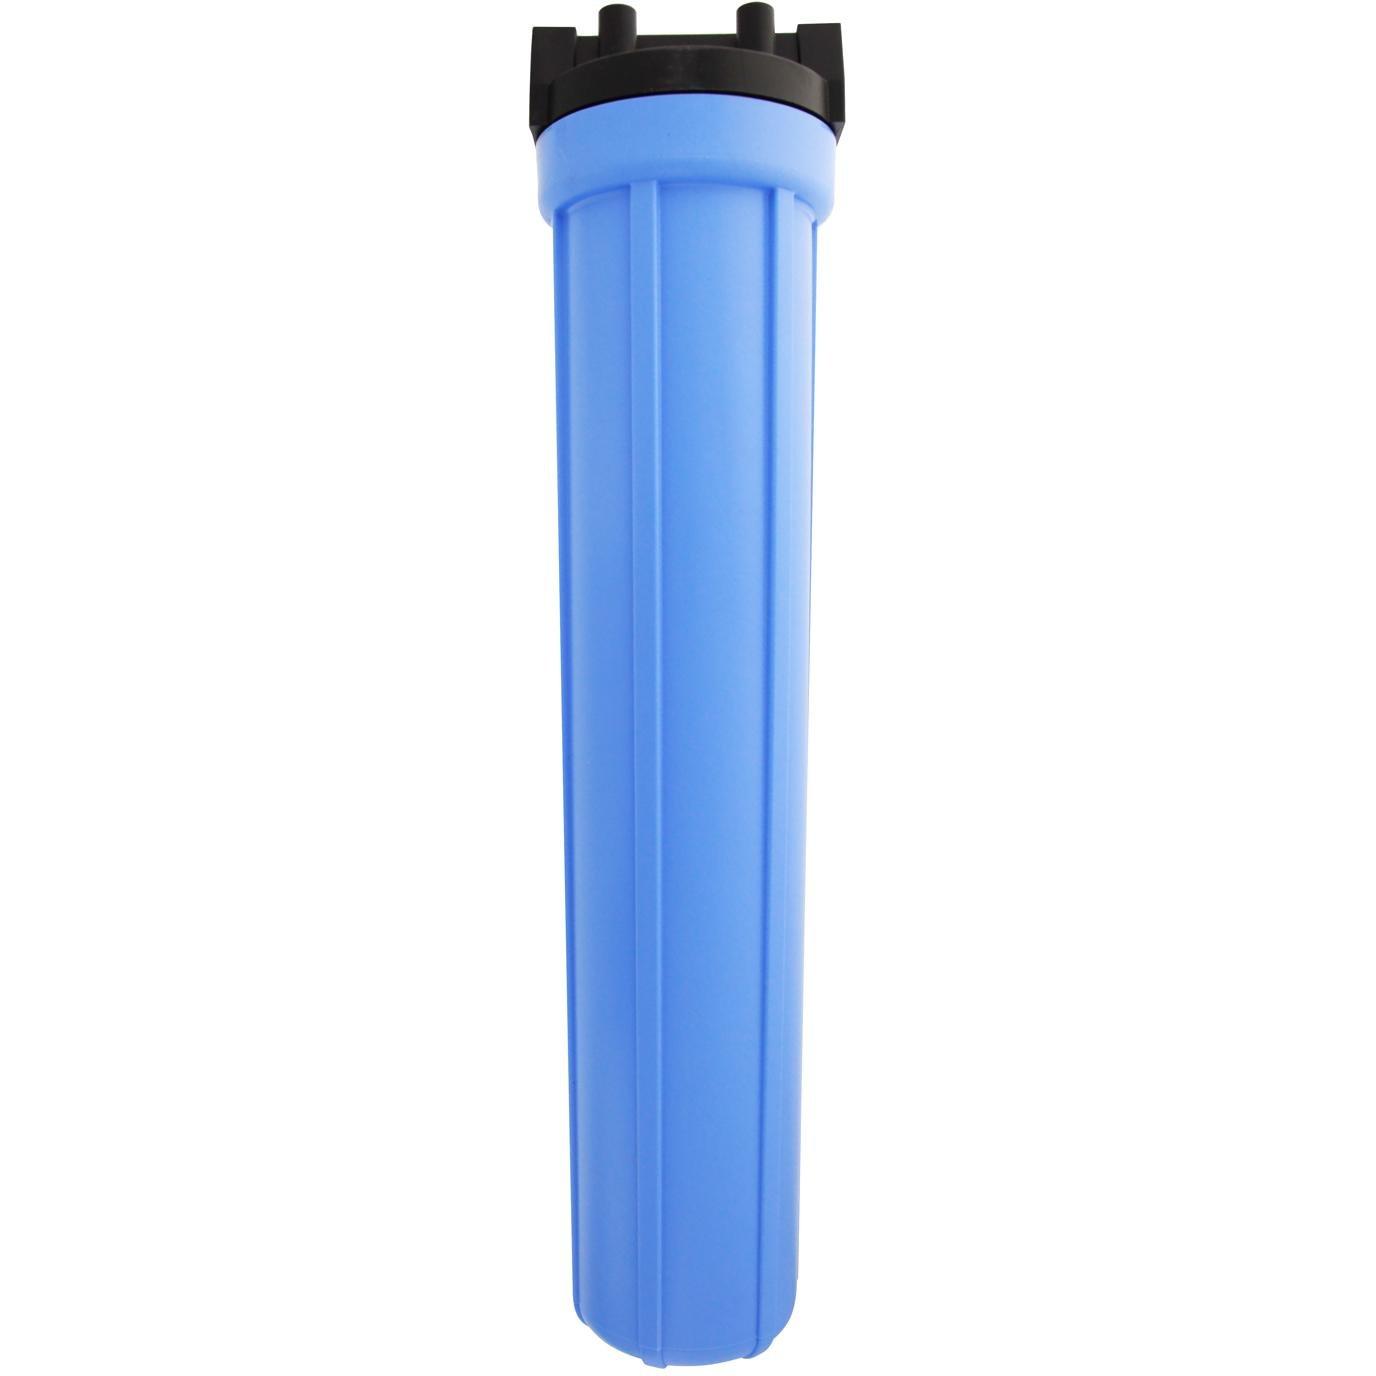 Pentek PENTEK 150069 Water Filter Housing 20